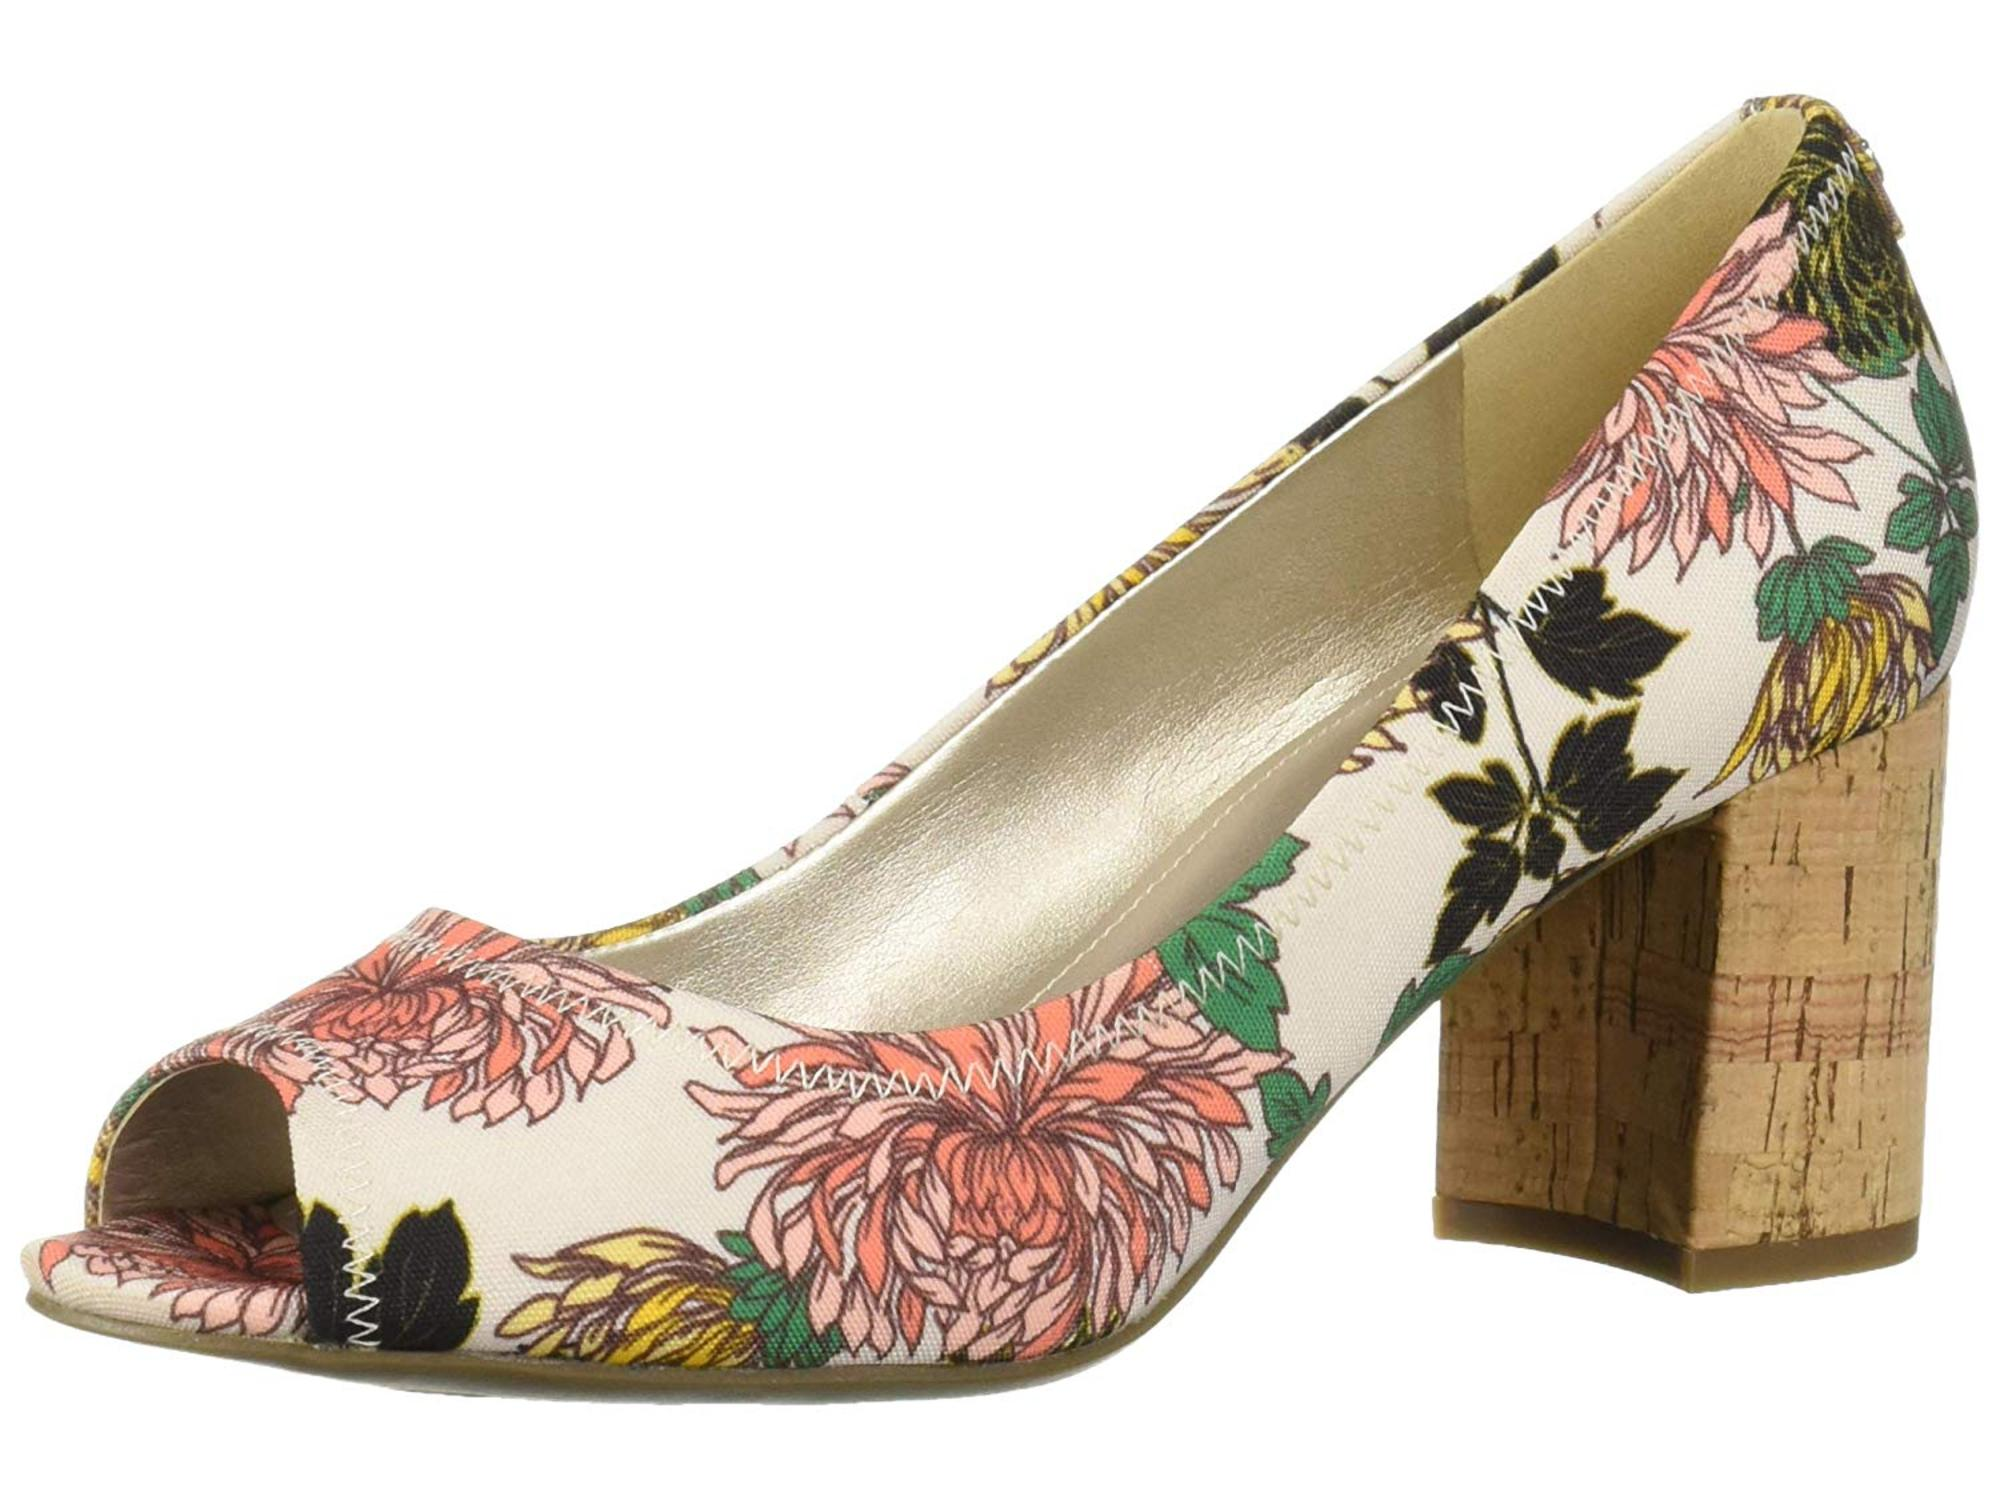 Ellie Shoes E-821-Glitter 8 Pointed Stiletto Sandal with Glitter